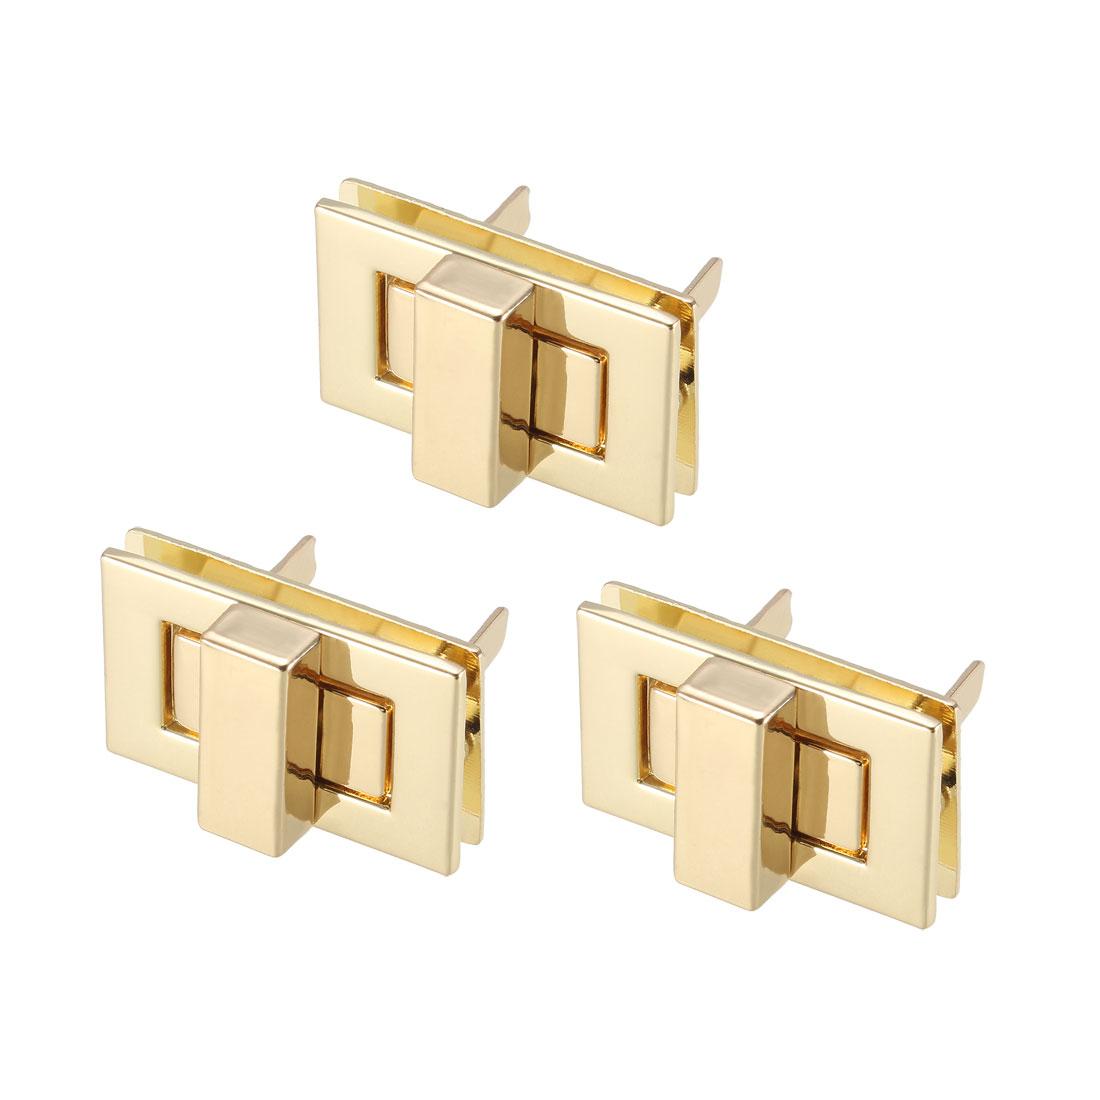 3 Sets Rectangular Purses Twist Lock 32mm x 20mm Clutches Closures - Light Gold